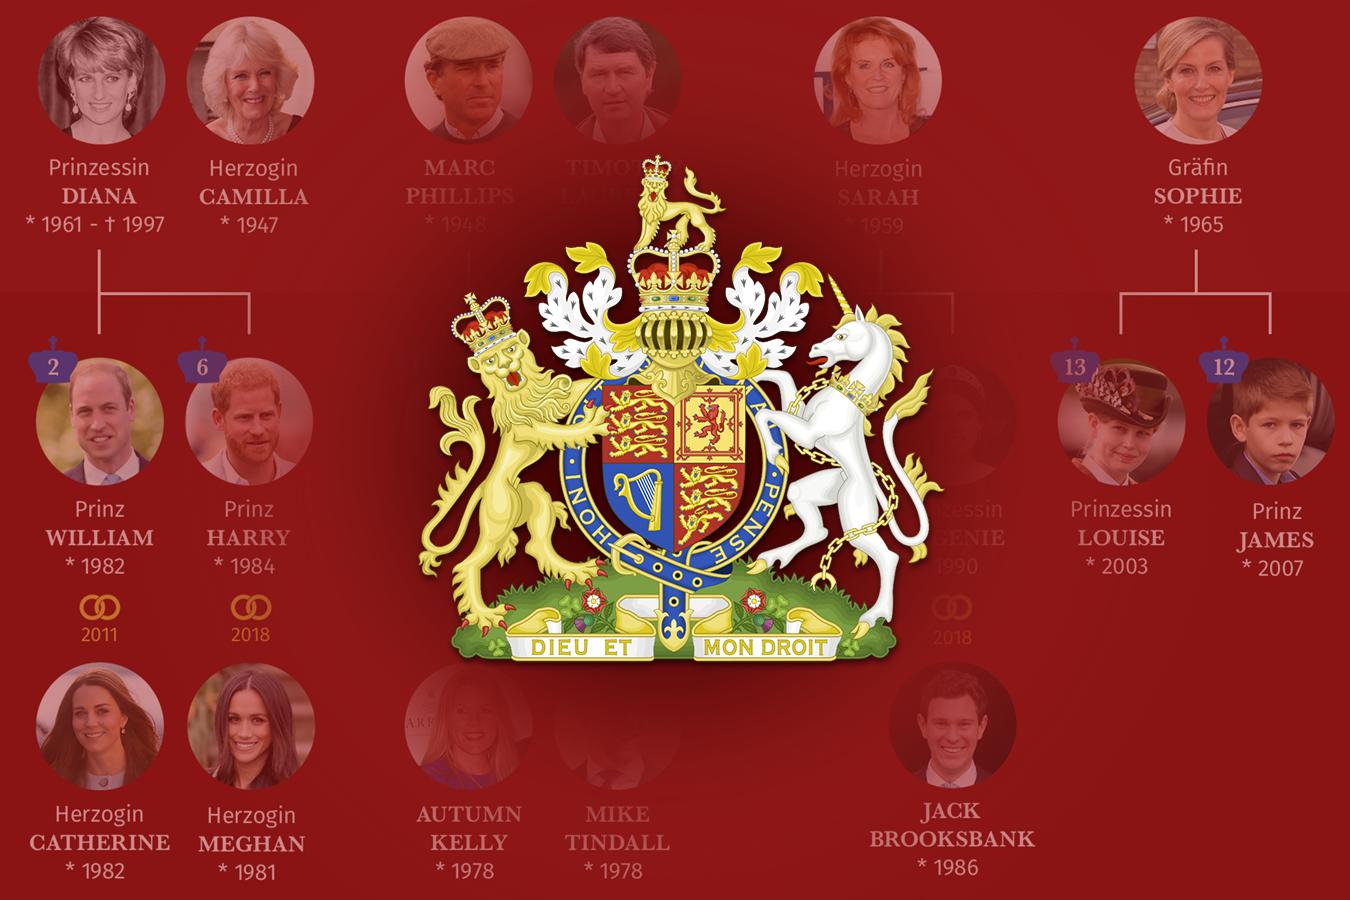 Bild zu Königsfamilie England, Windsors, Wappen